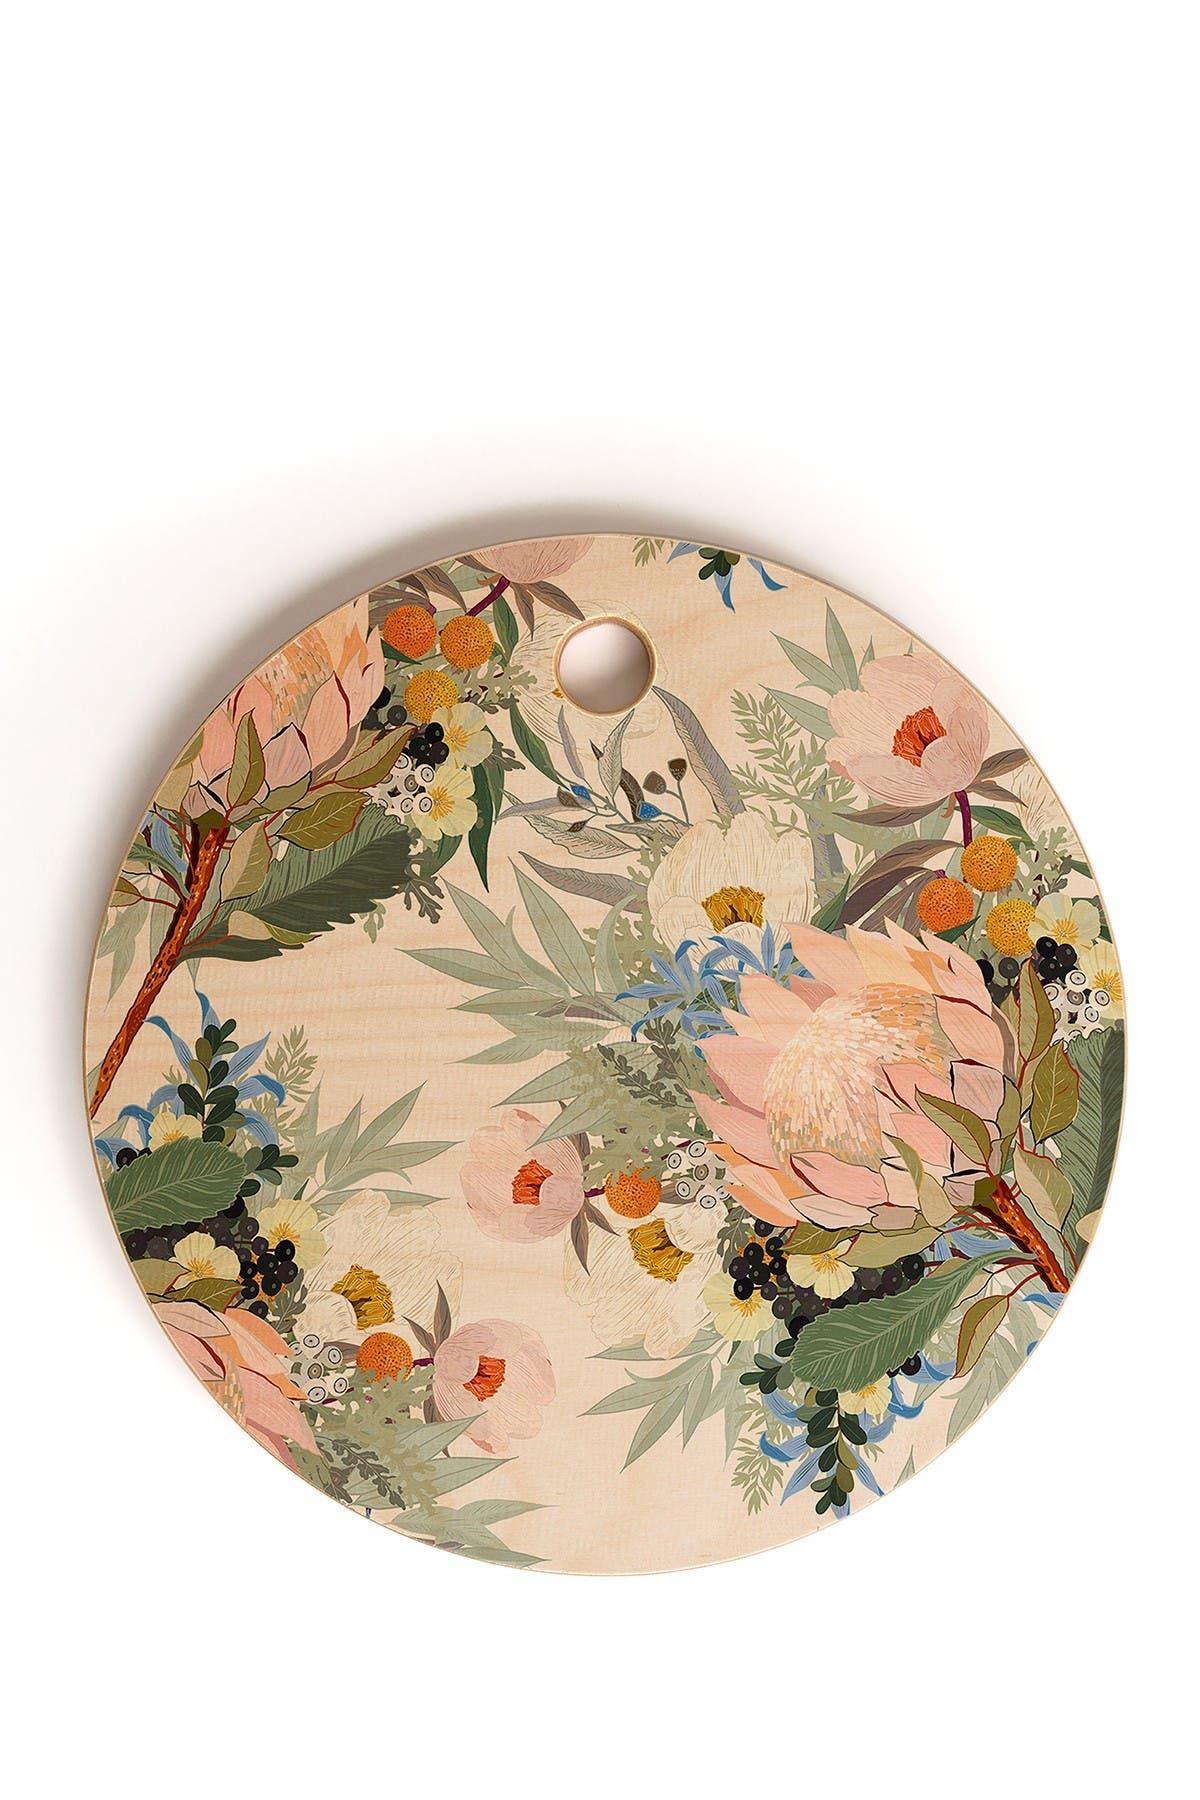 Image of Deny Designs Iveta Abolina Protea Emmaline Round Cutting Board